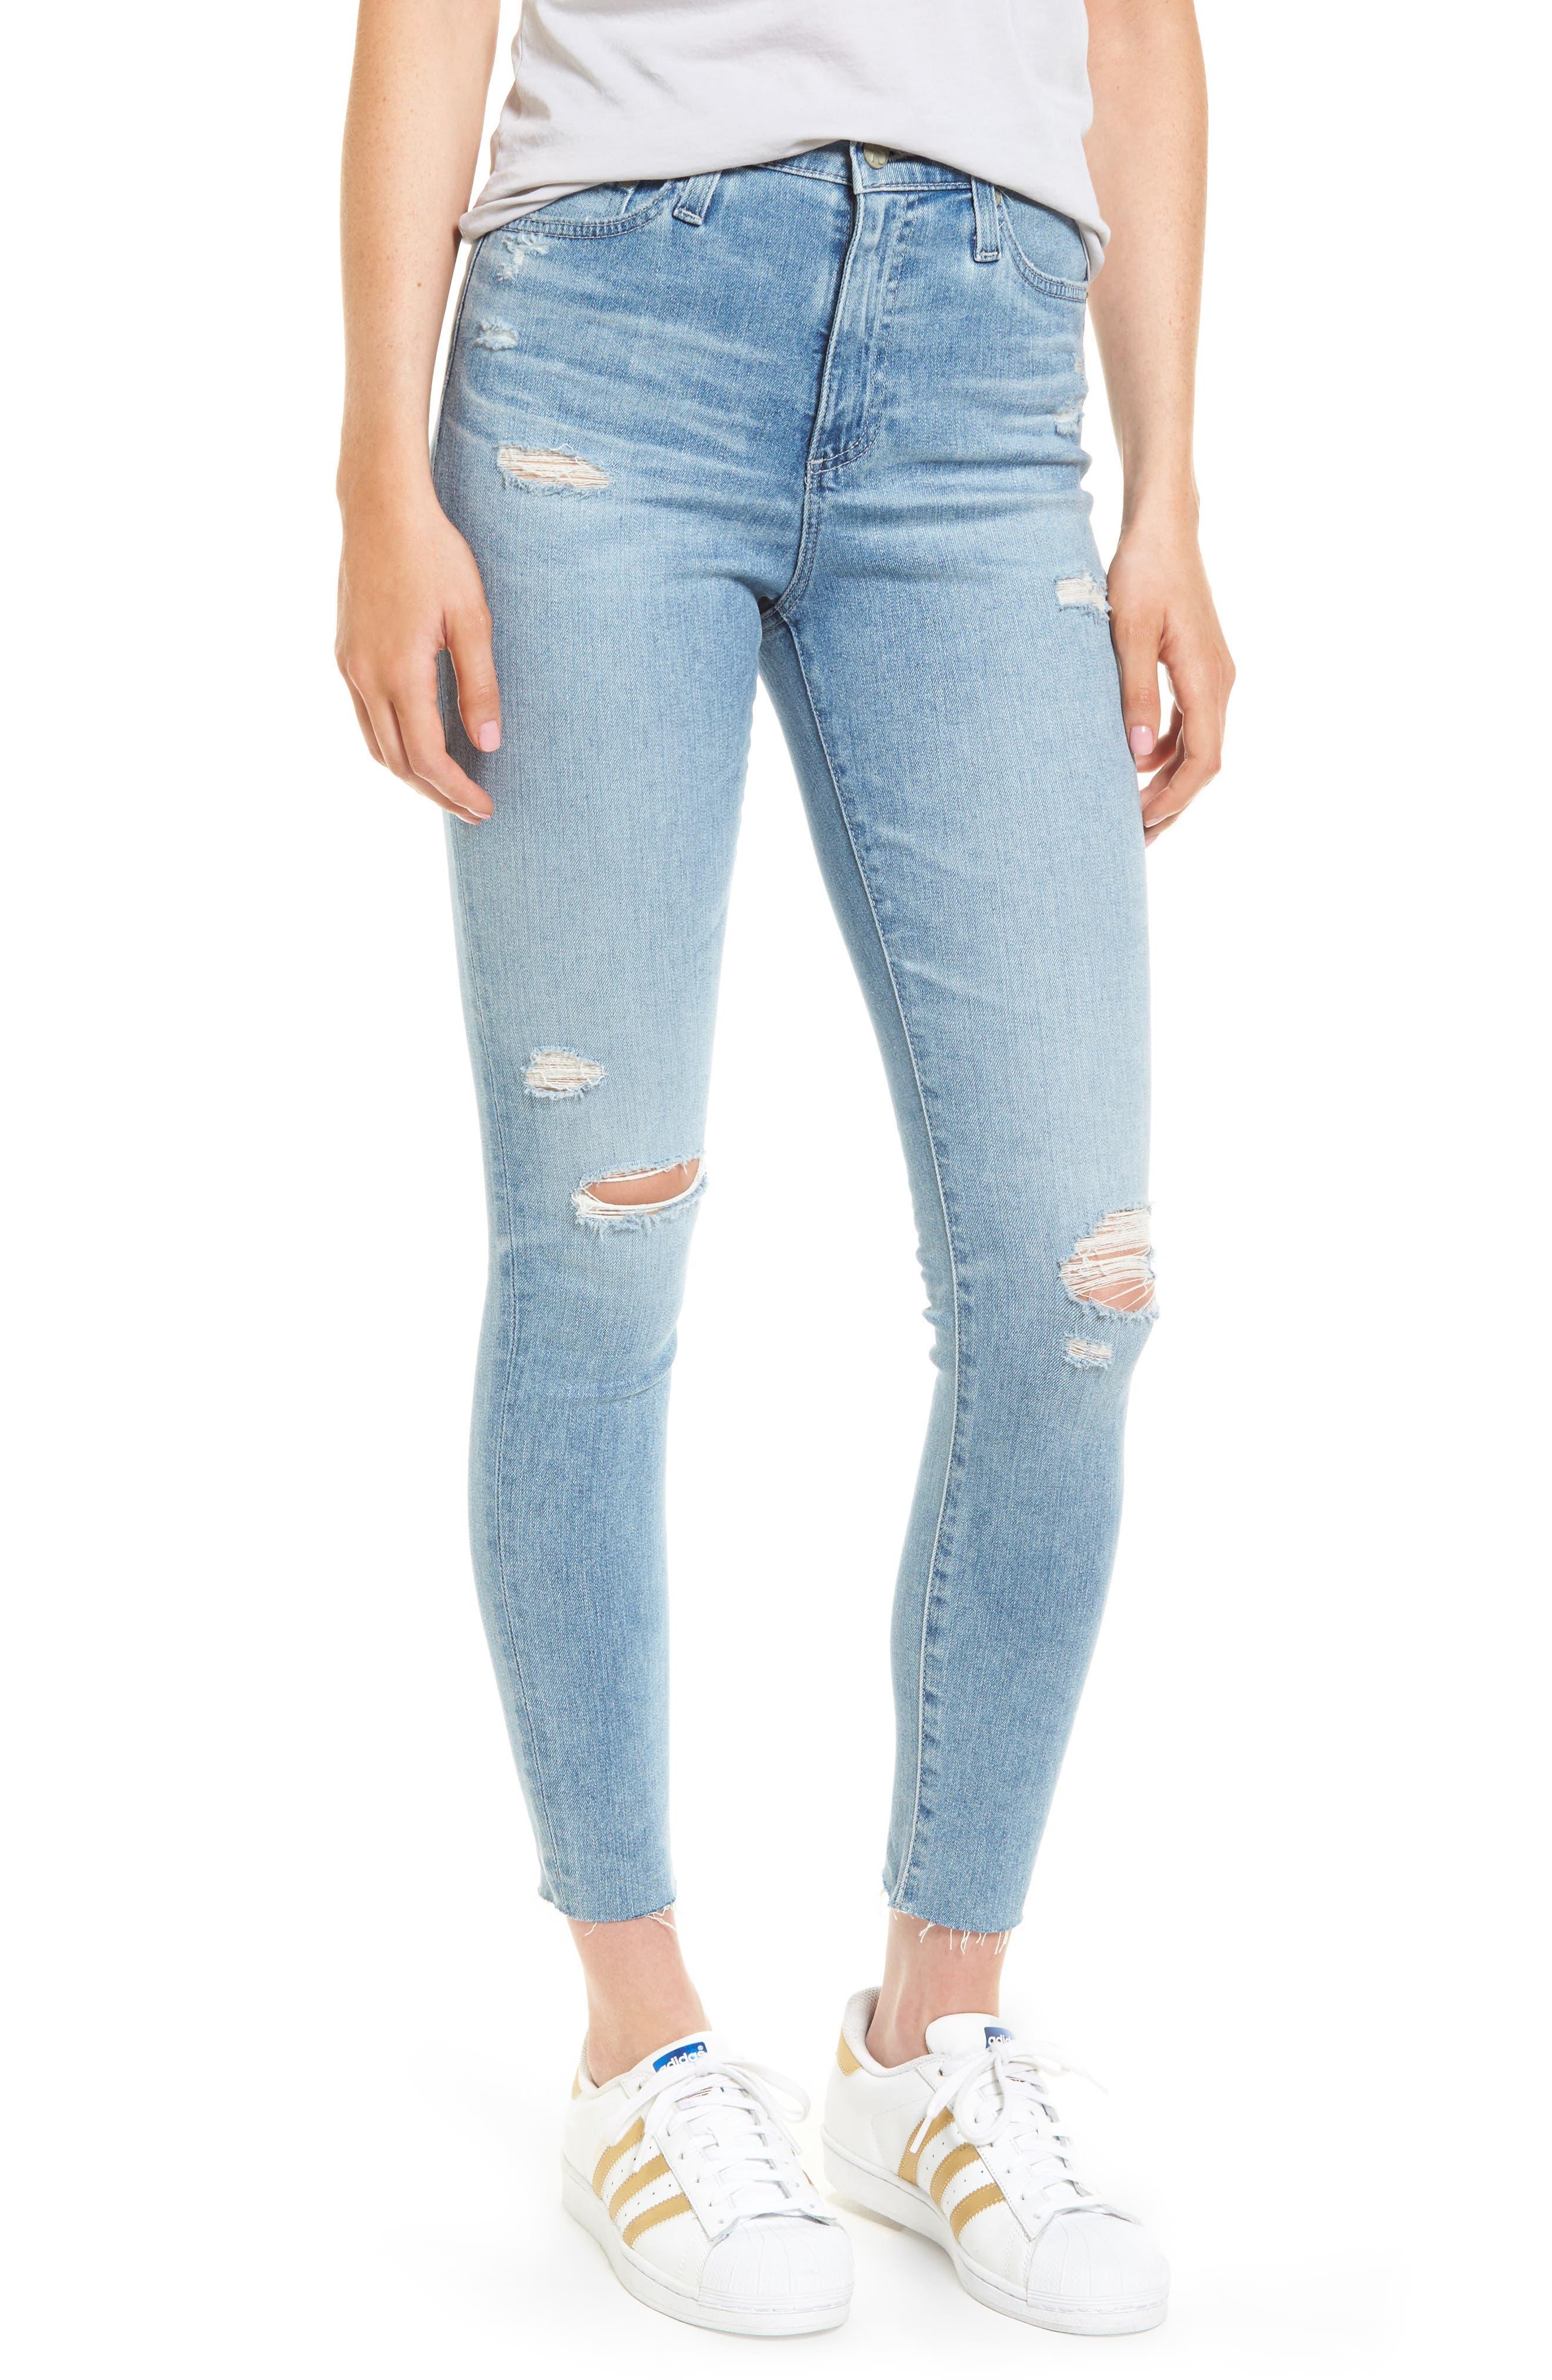 Mila High Waist Ankle Skinny Jeans,                             Main thumbnail 1, color,                             20 Years-Oceana Destructed